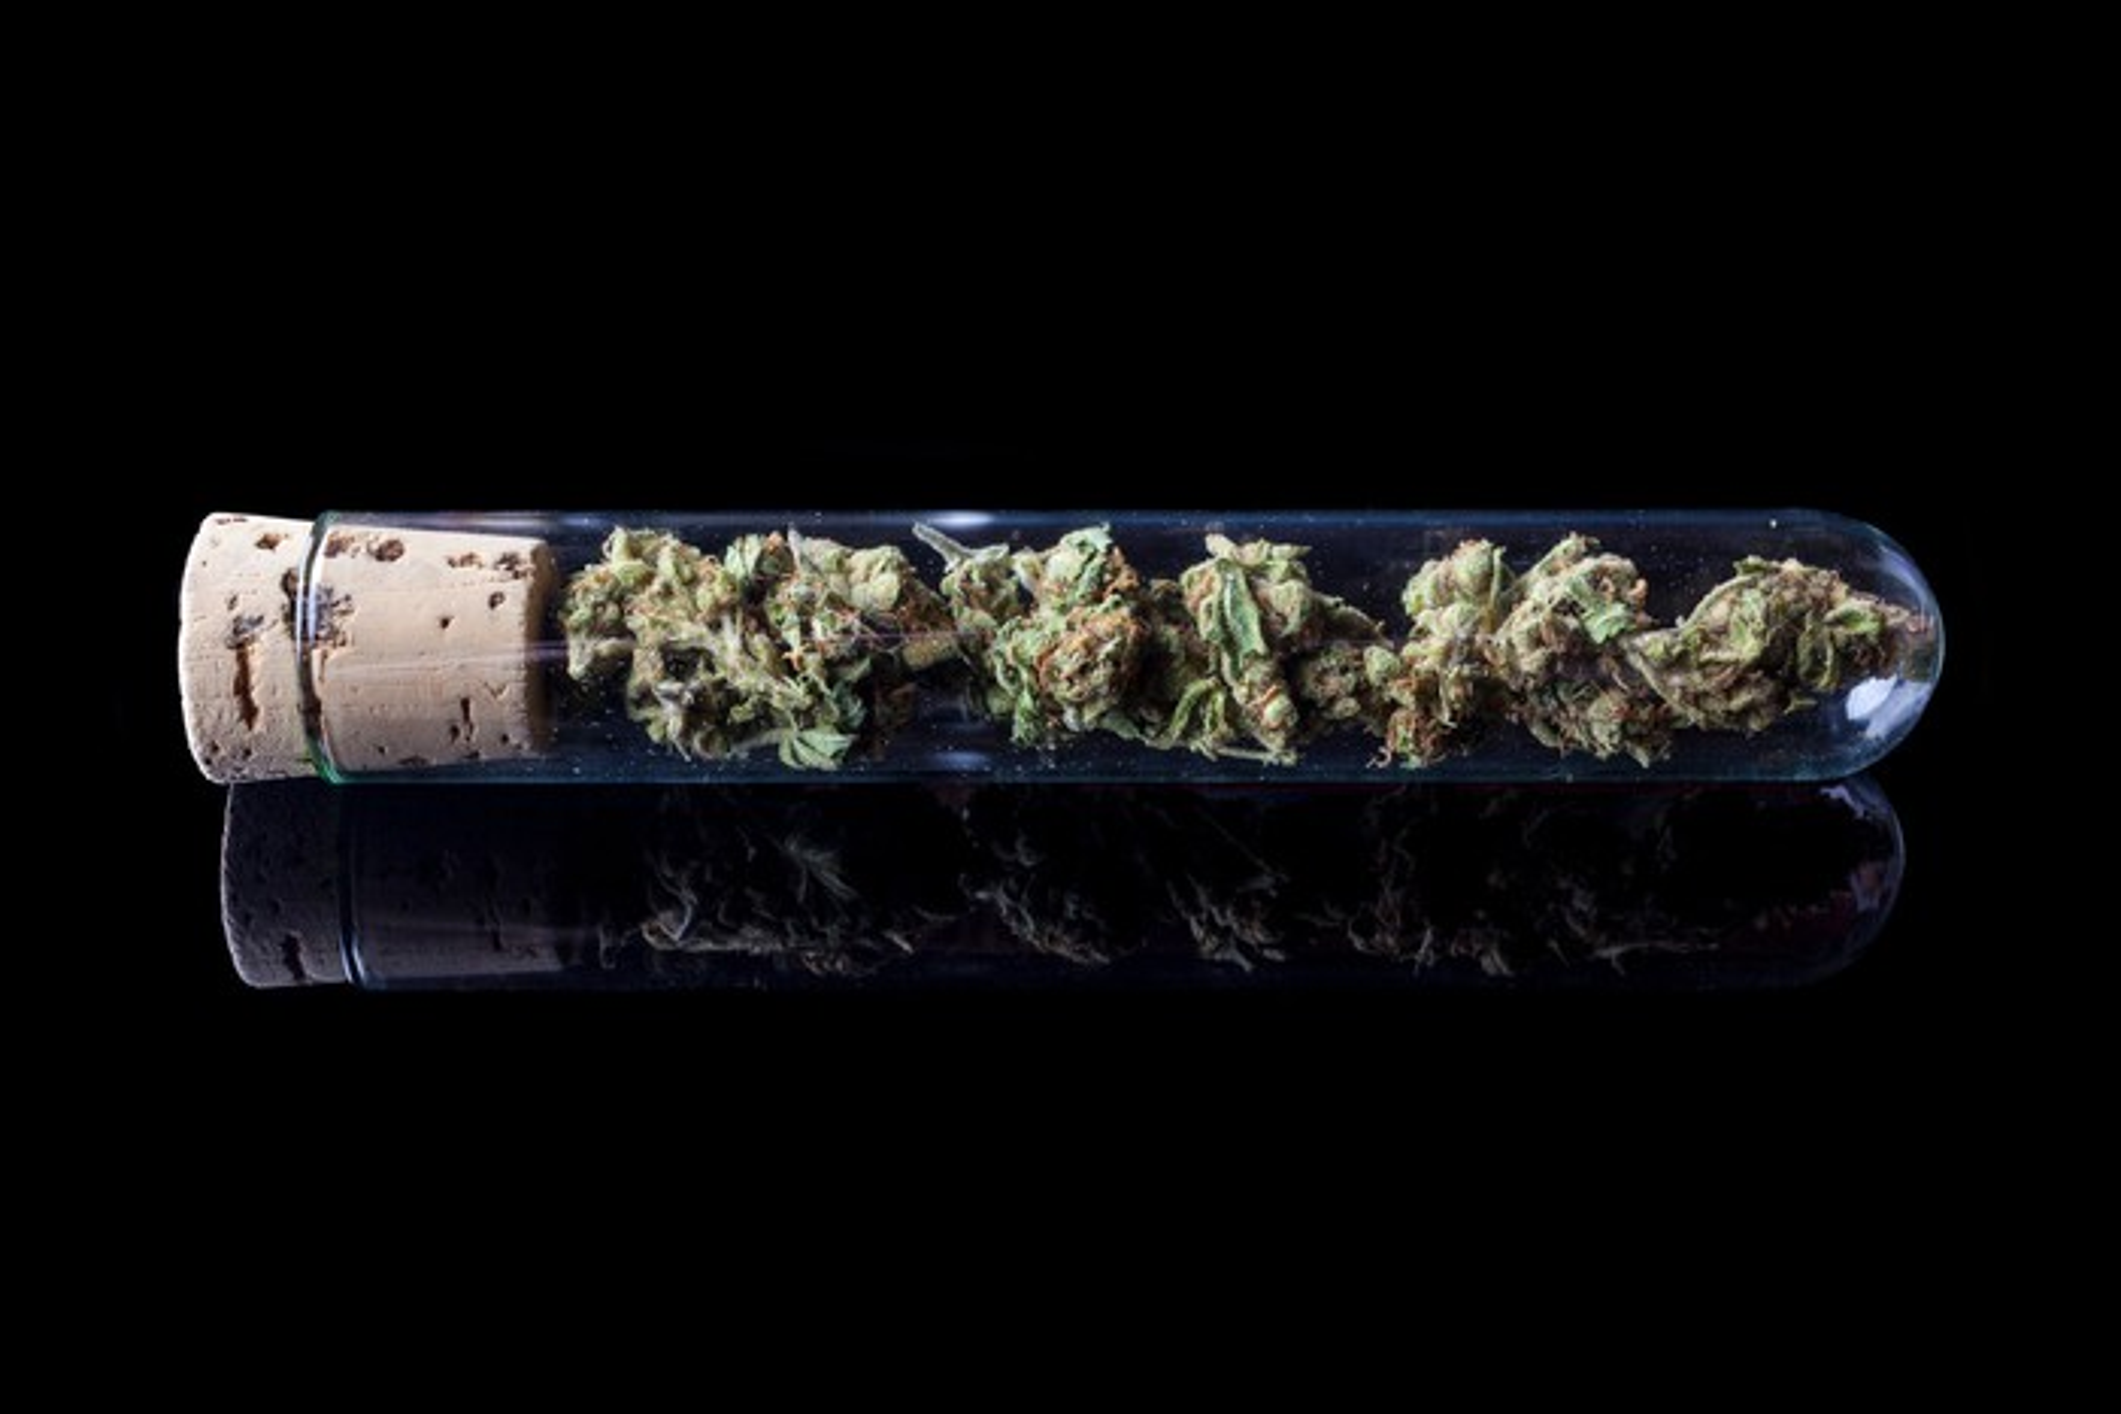 Marijuana in test tube